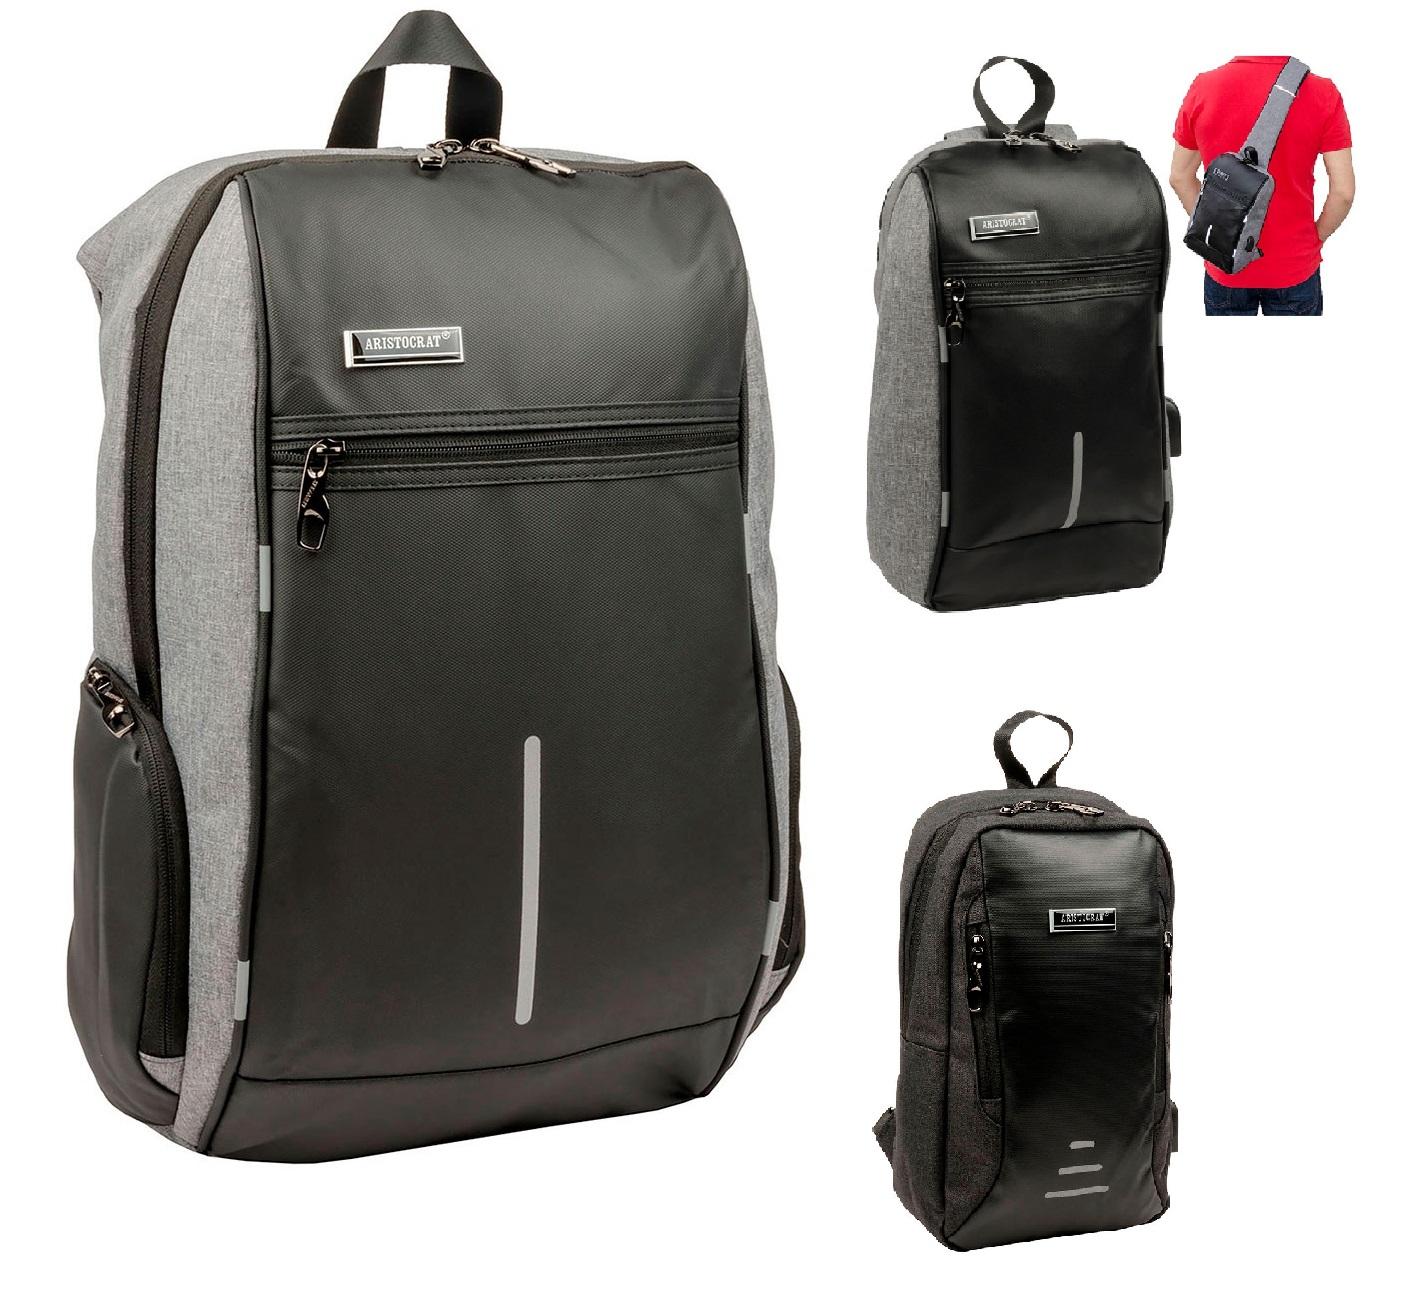 Рюкзаки, сумки для компьютера